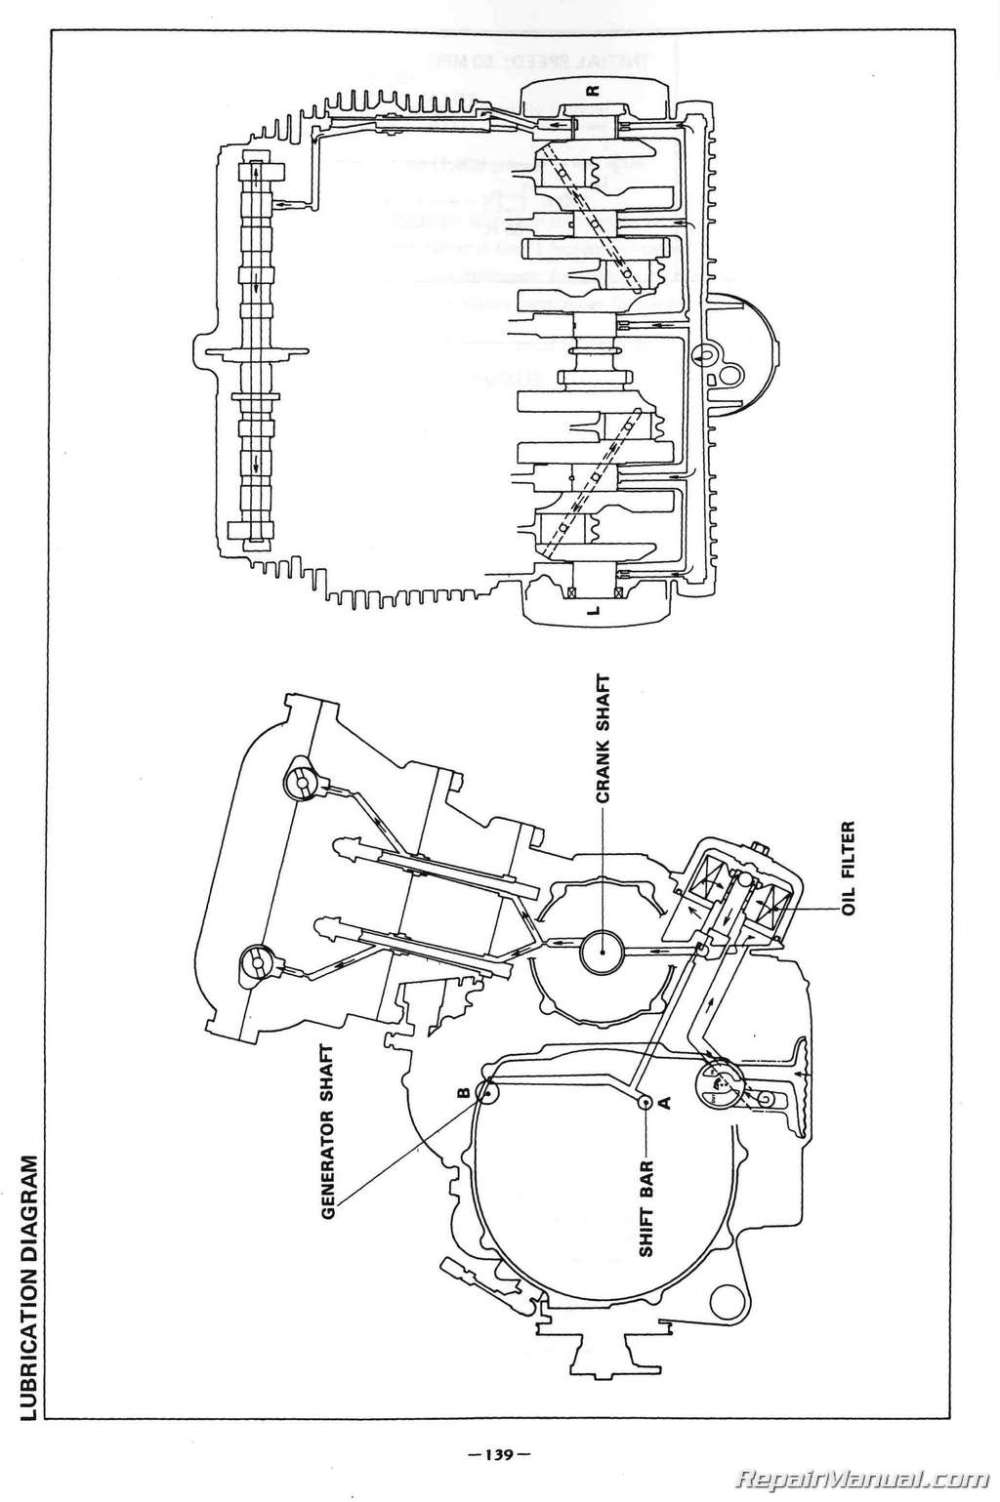 medium resolution of 83 yamaha 400 x wiring diagram